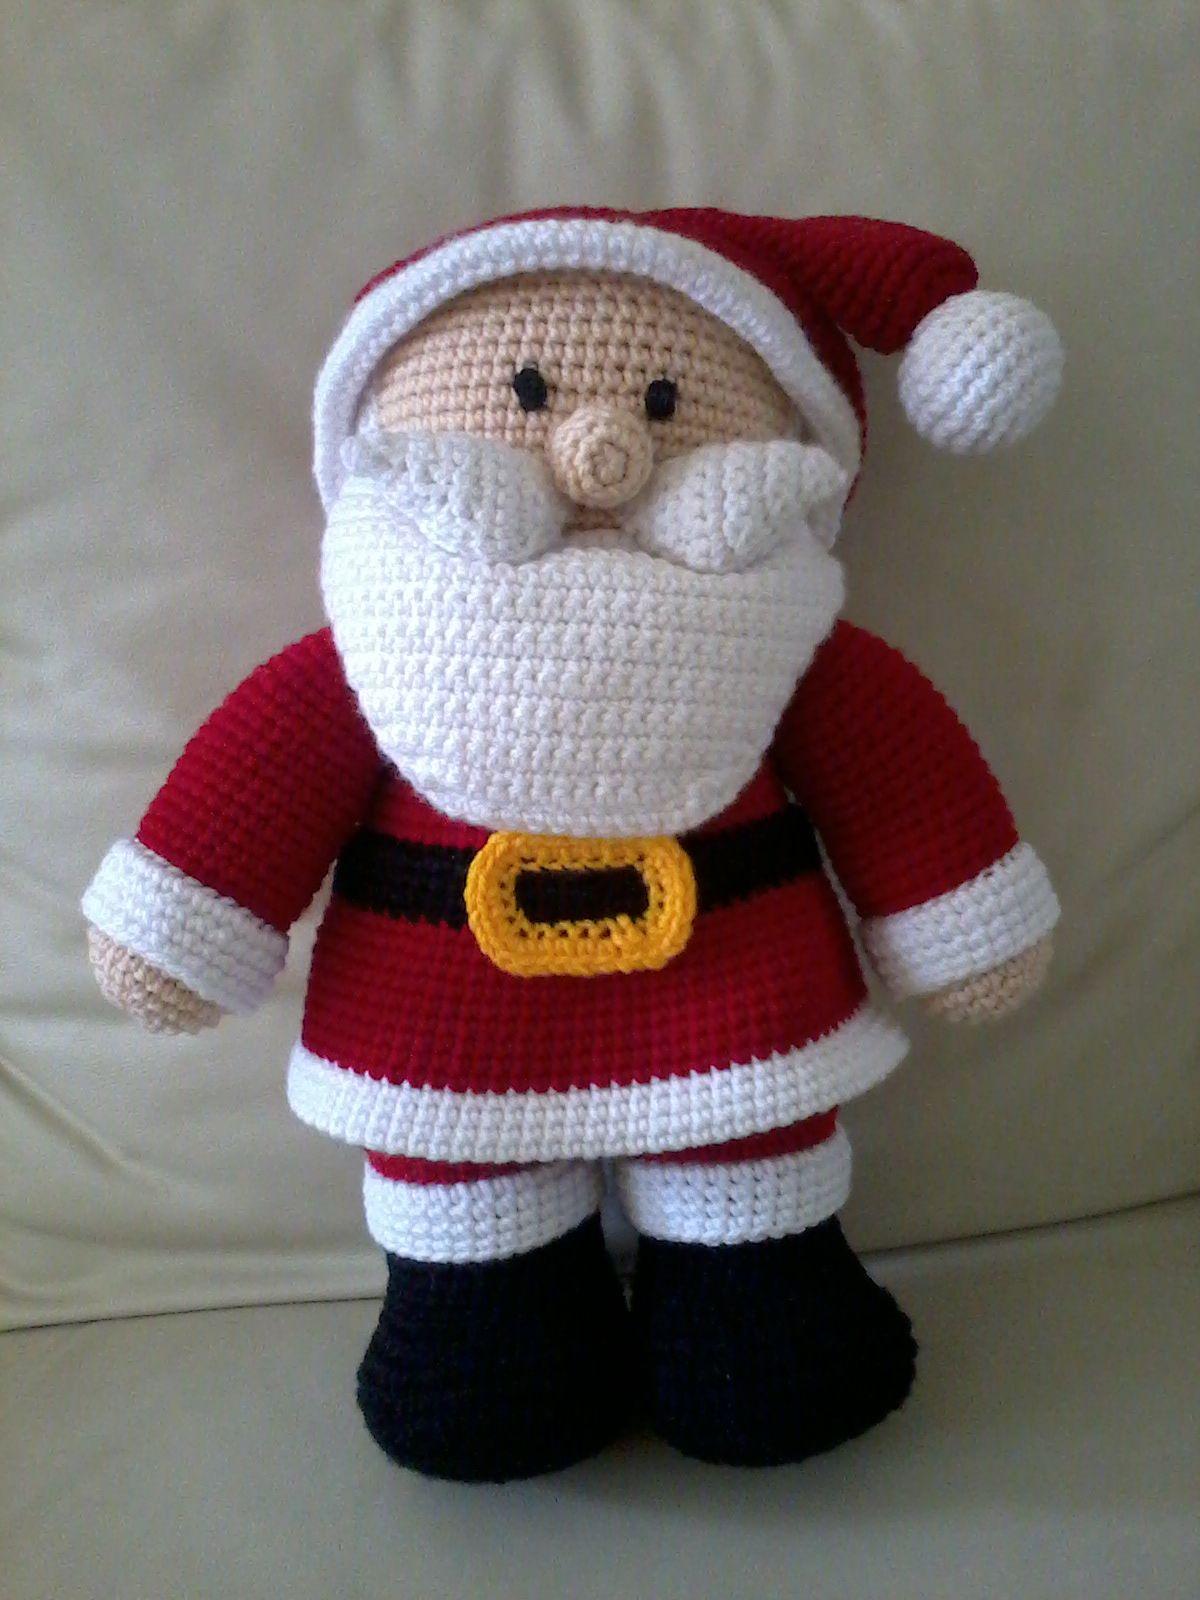 Figuras navideñas tejidas a crochet02   Ganchillo navideño ...   1600x1200